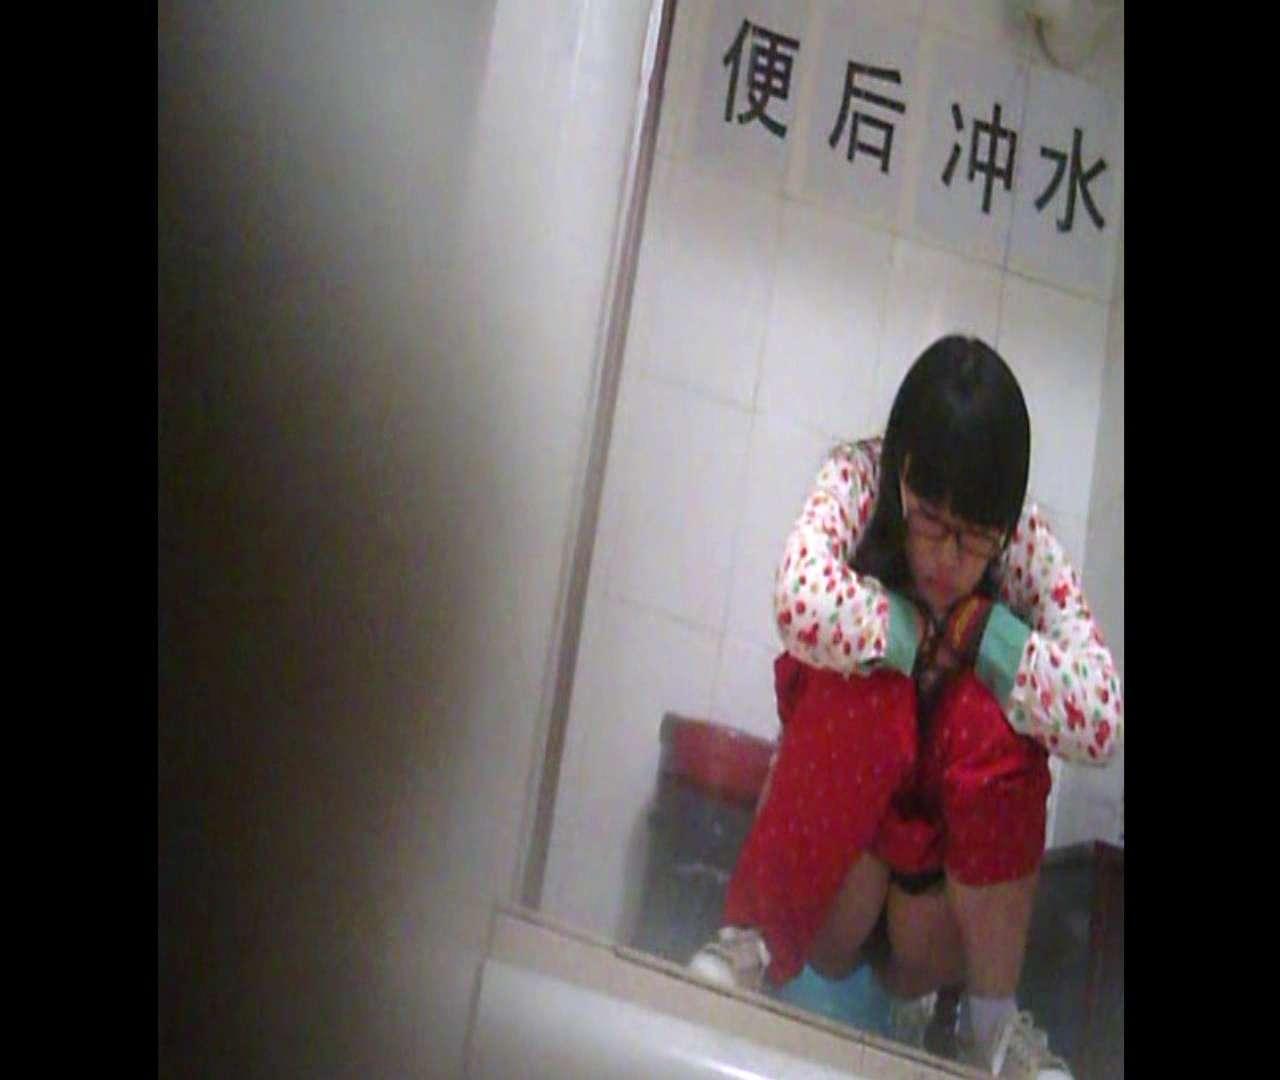 Vol.01 赤のパンツスタイルがとっても眩しい!! 洗面所 | 丸見え  61画像 31